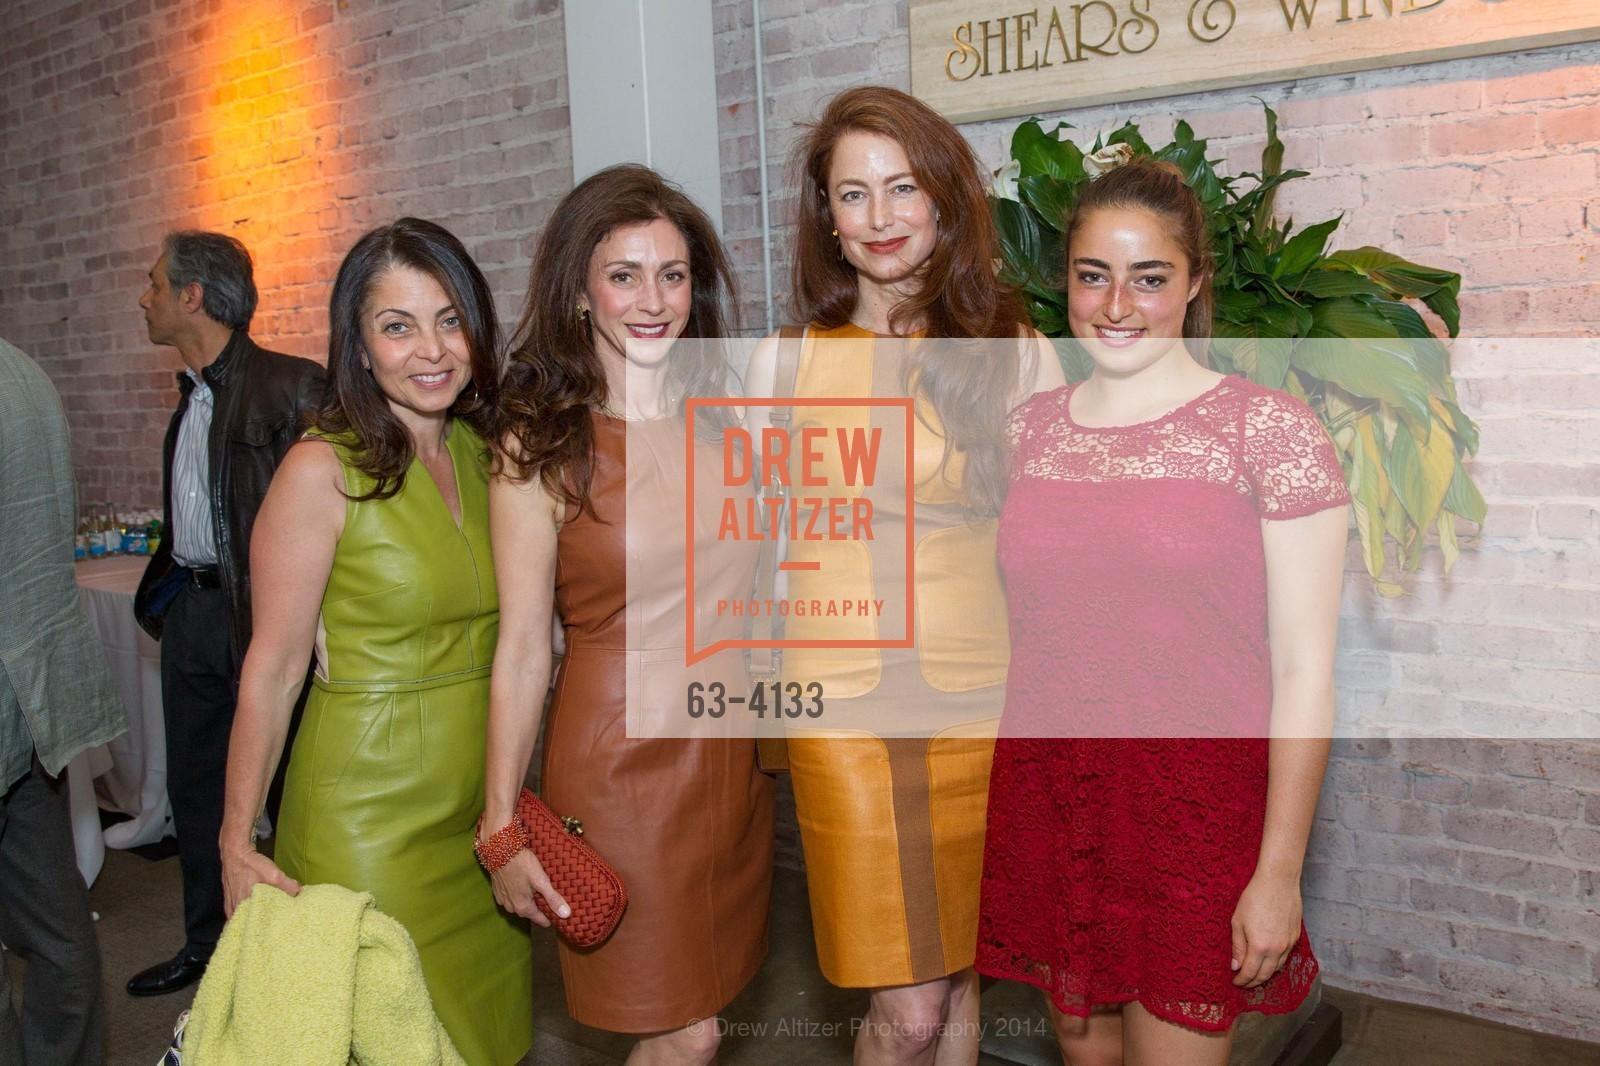 Neda Nobari, Maryam Muduroglu, Sheila Nahi, Kayla Nahi, Photo #63-4133